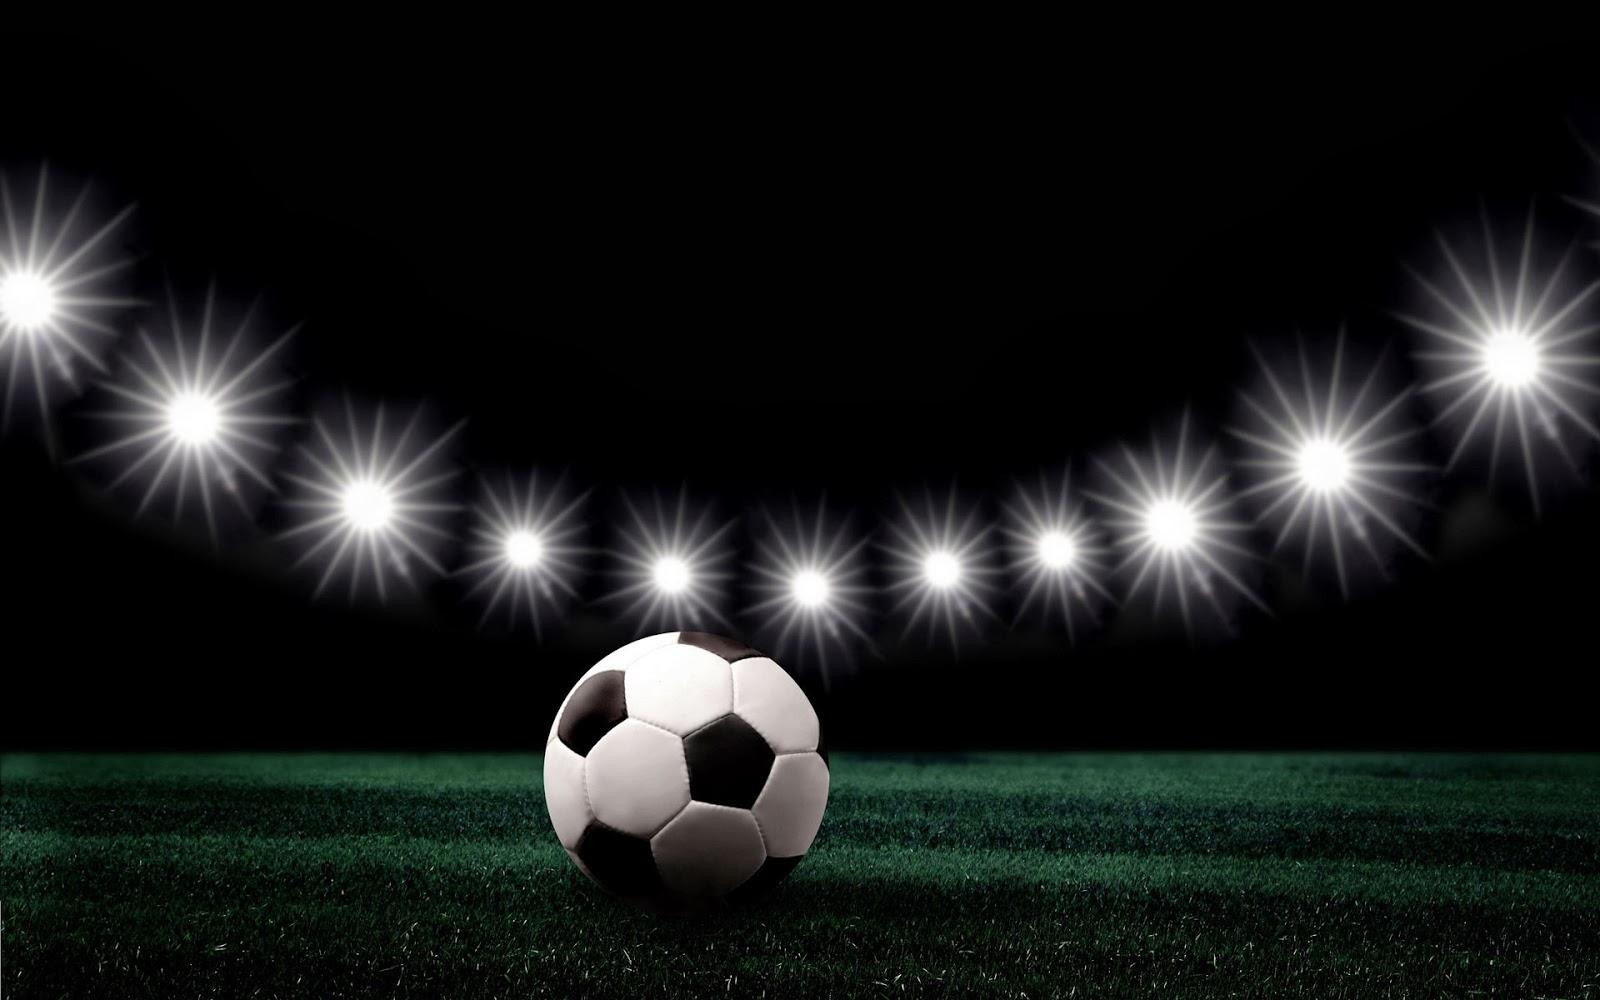 Football HD Wallpapers 2014-2015